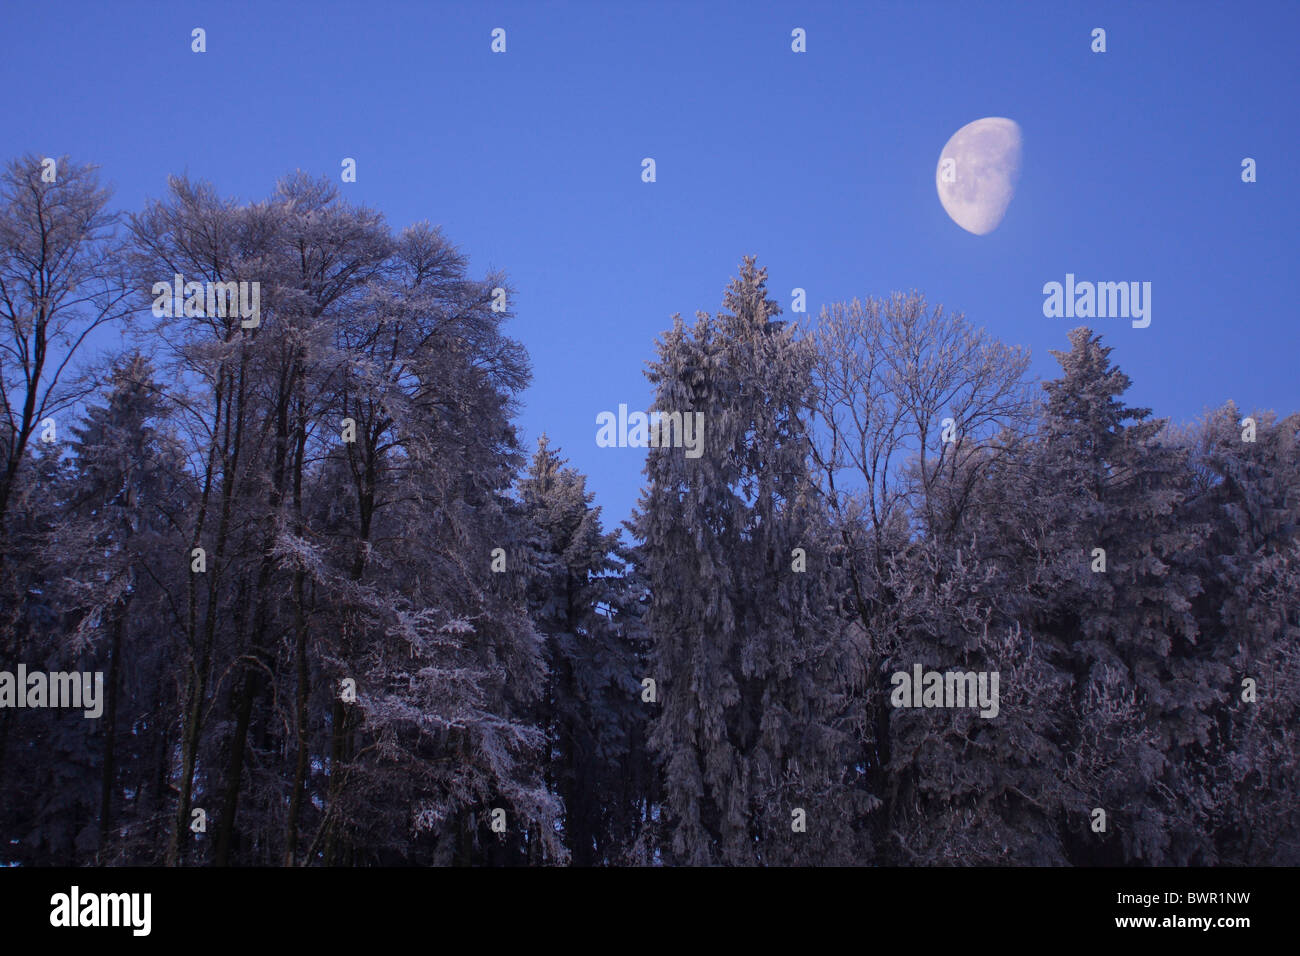 forest winter moonshine moon Switzerland Europe nature trees tree snow blue sky dusk dawn morning evenin - Stock Image